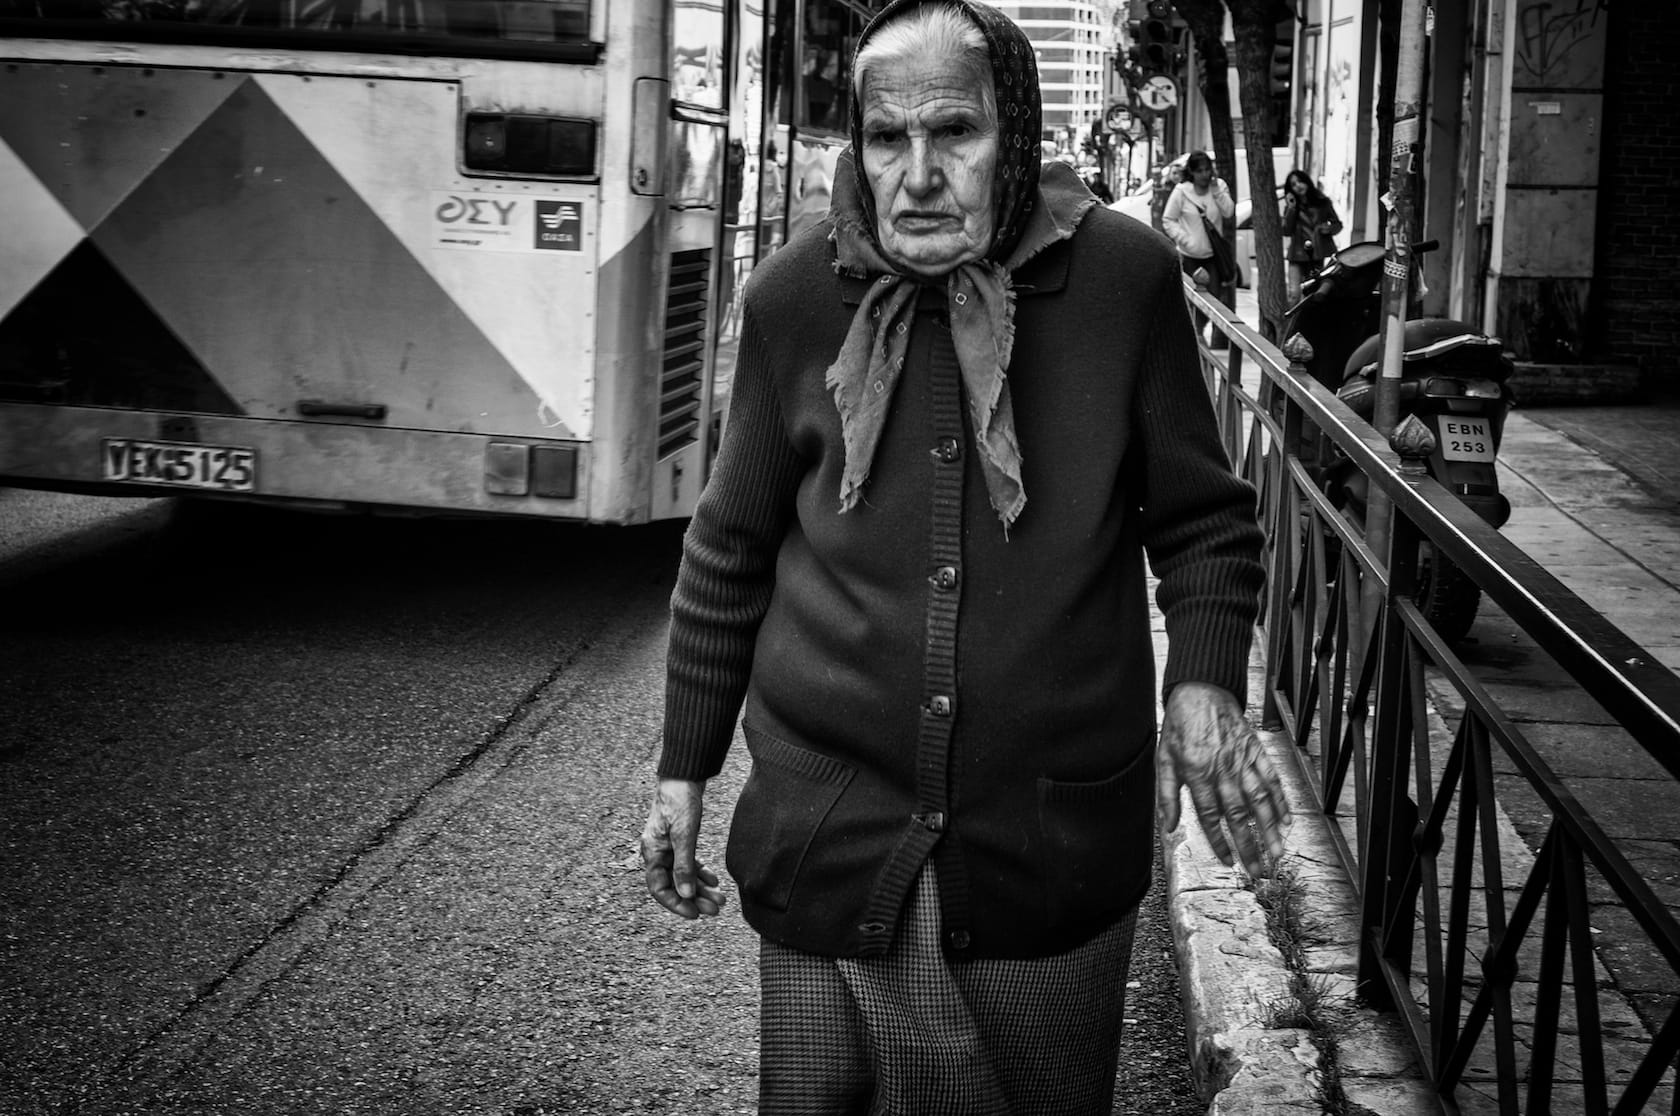 Old lady walking in the street